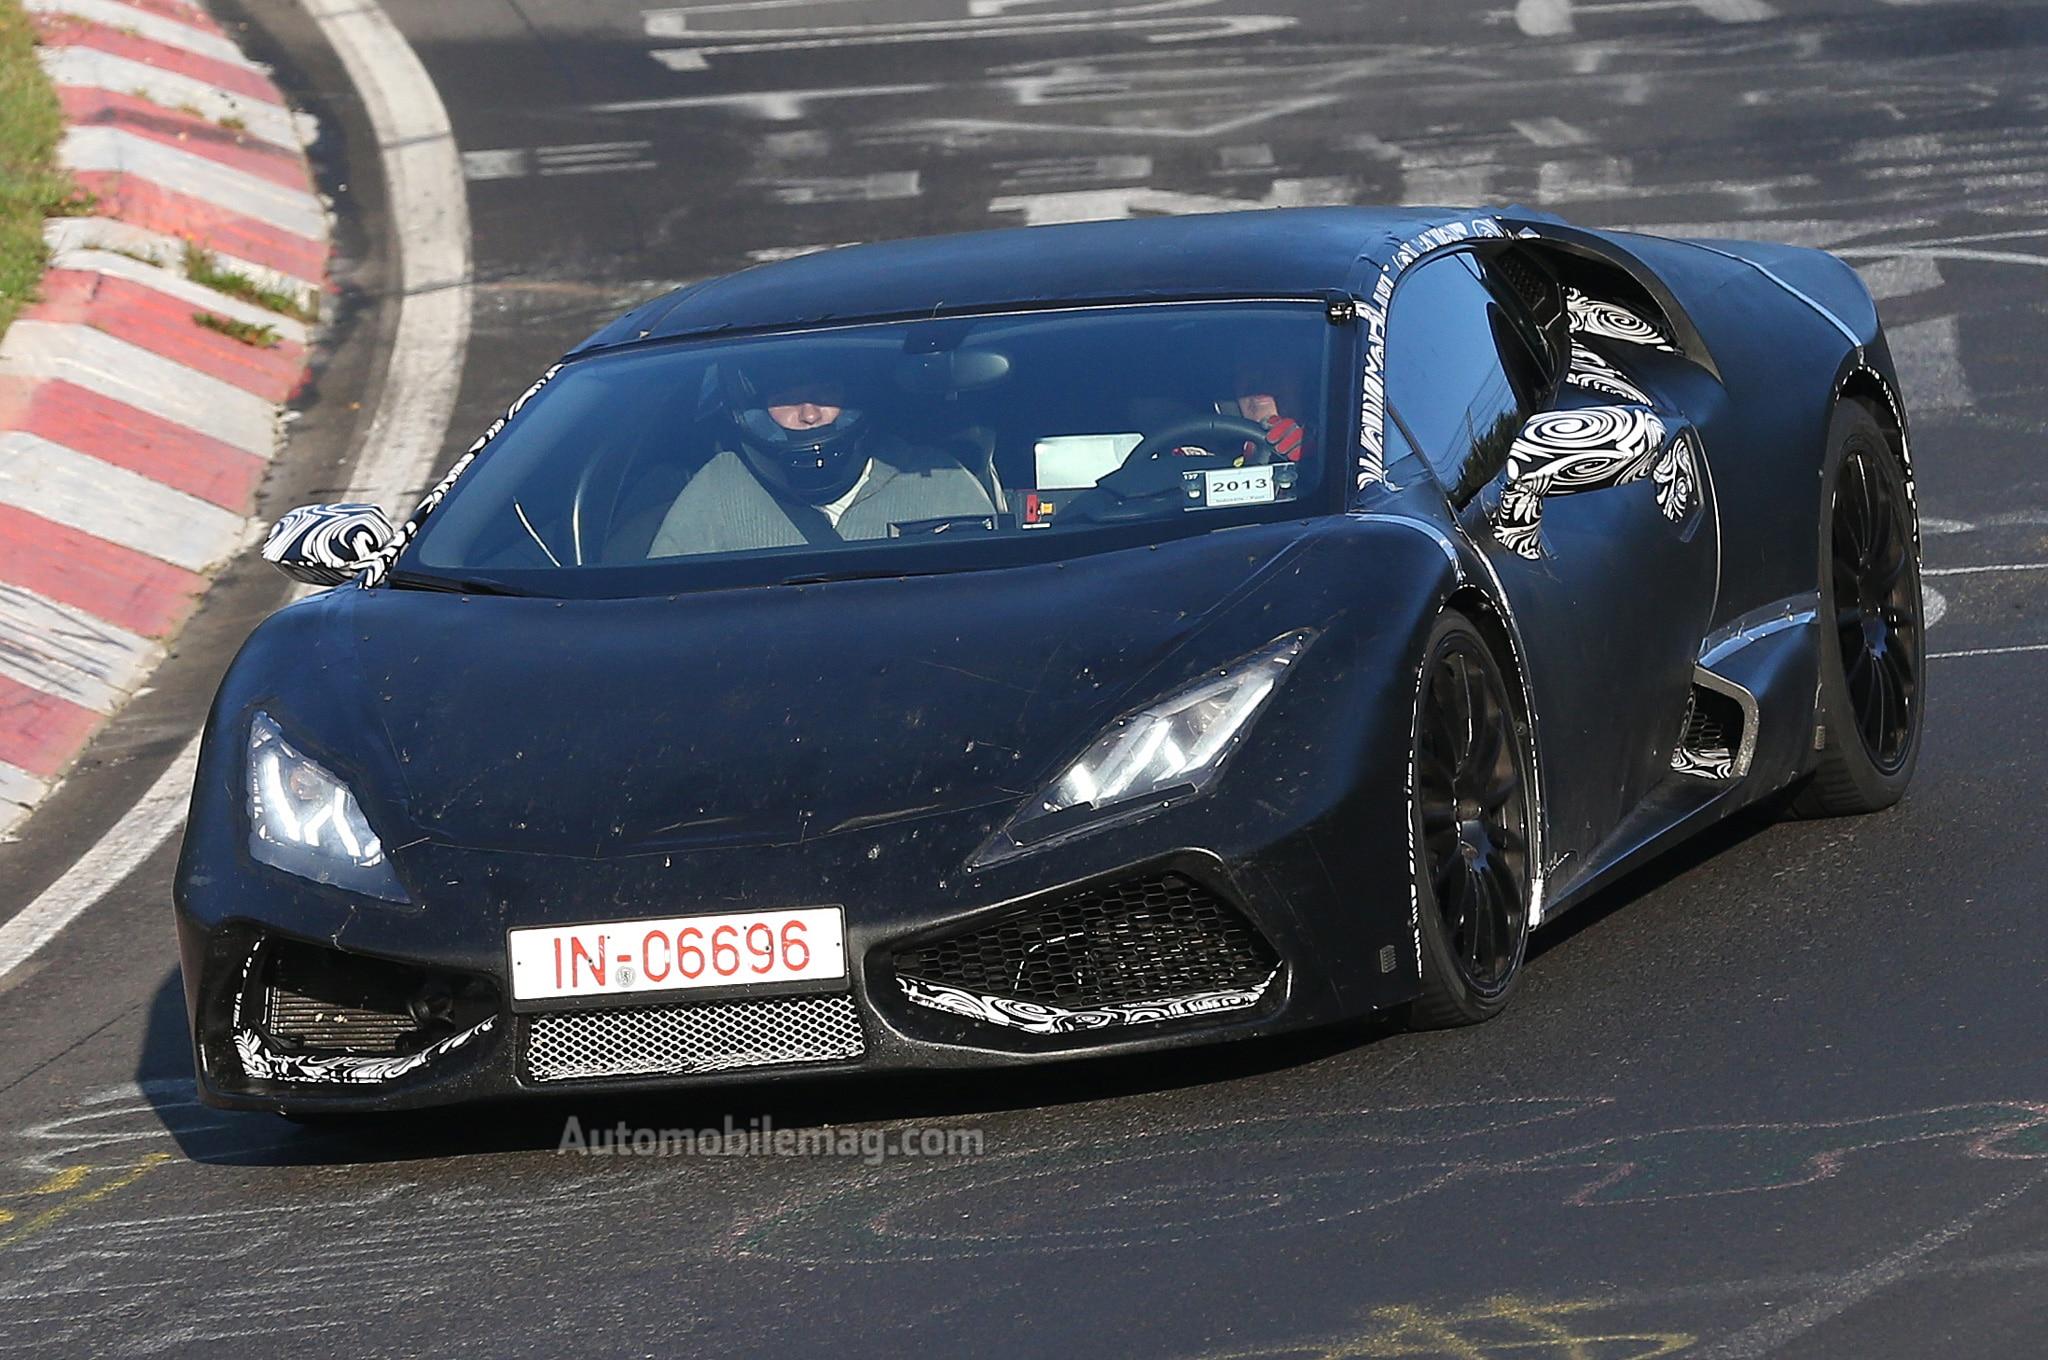 2015 Lamborghini Cabrera Prototype Testing On Nurburgring Front View 21